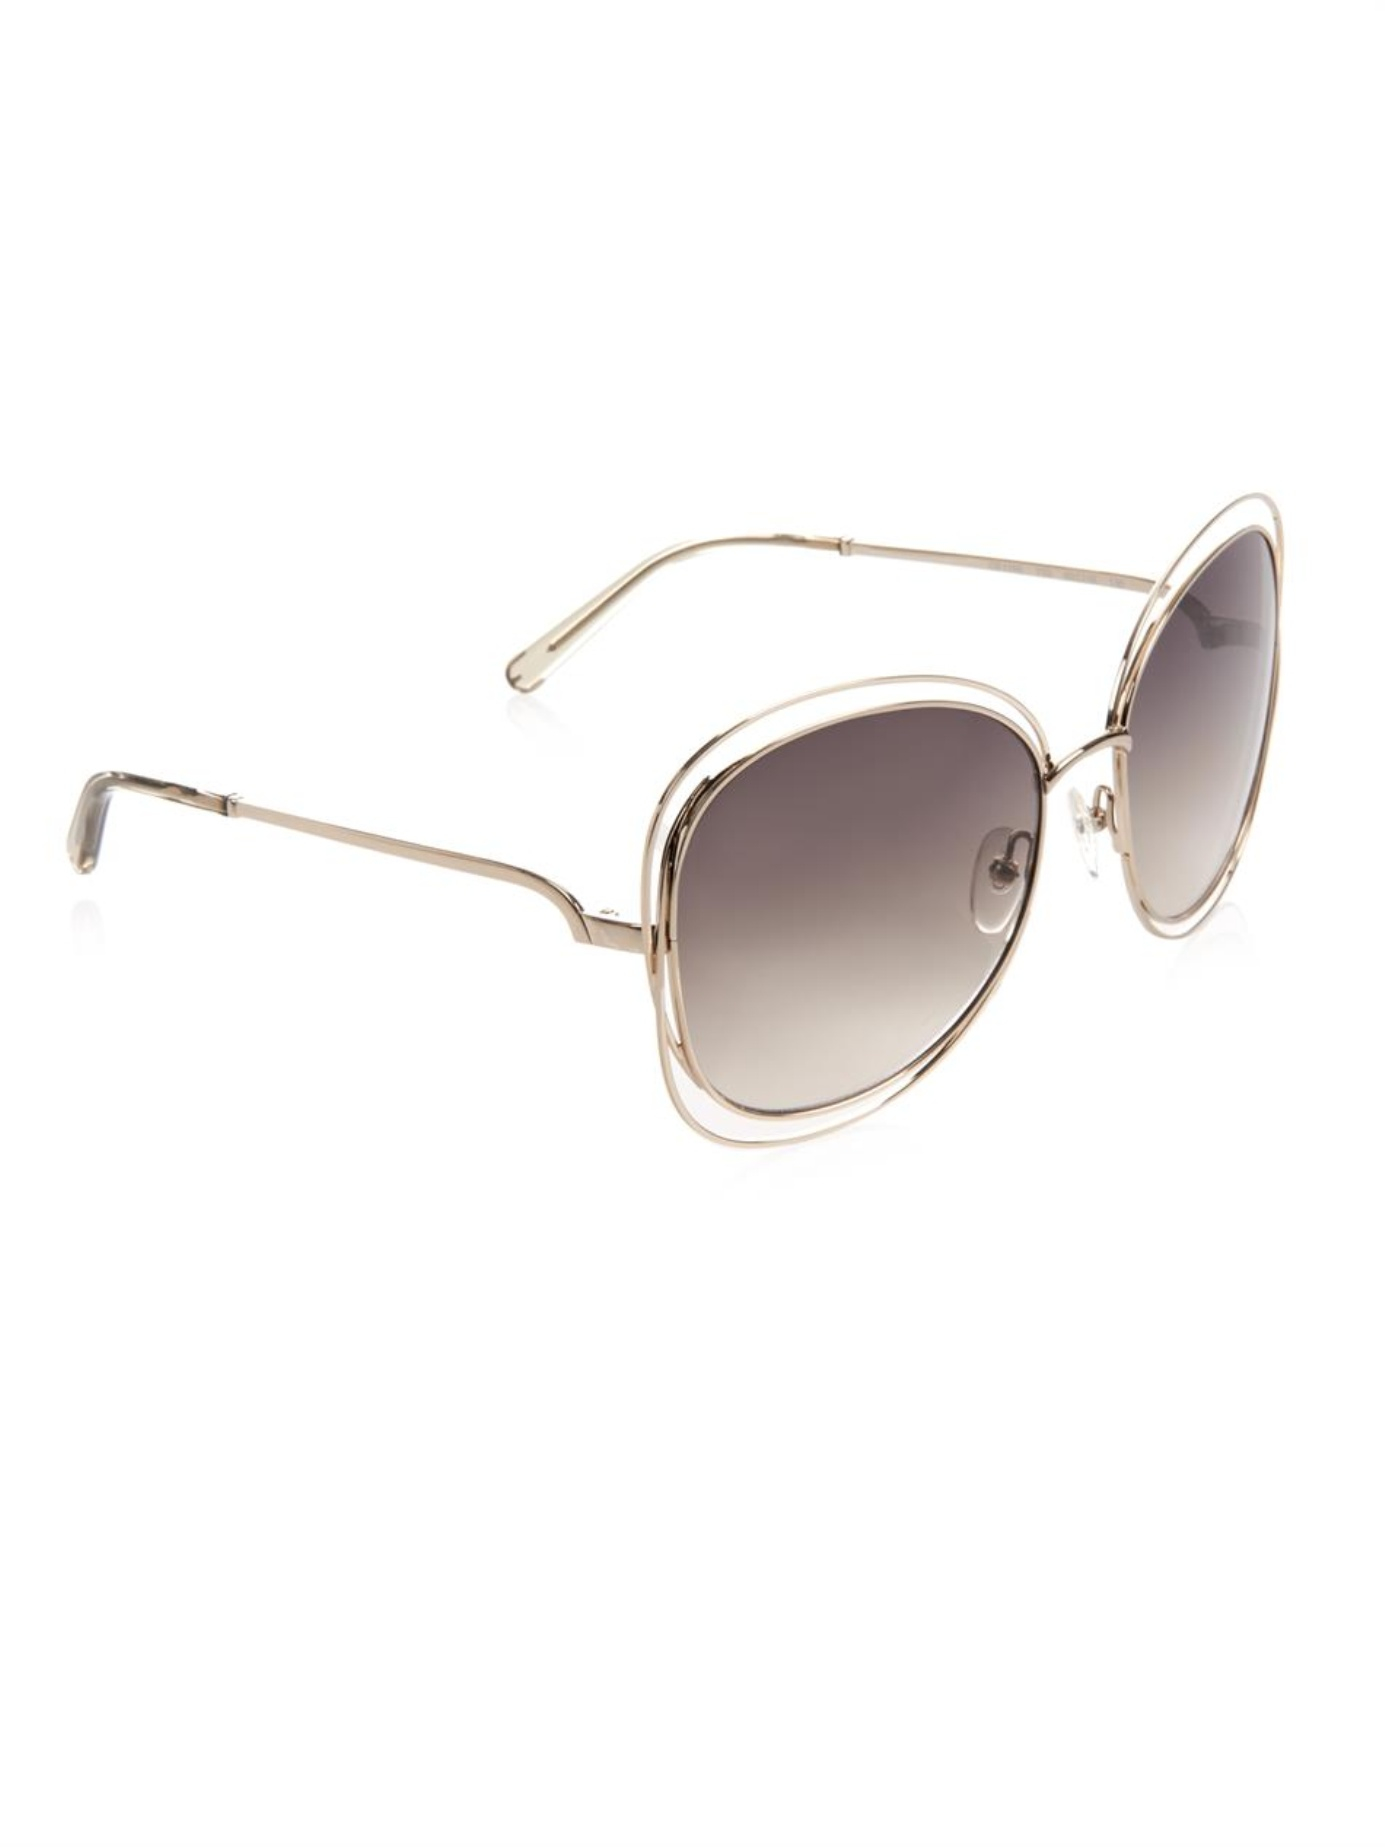 Chloe Gold Frame Sunglasses : Chloe Carlina Square-Framed Sunglasses in Metallic Lyst